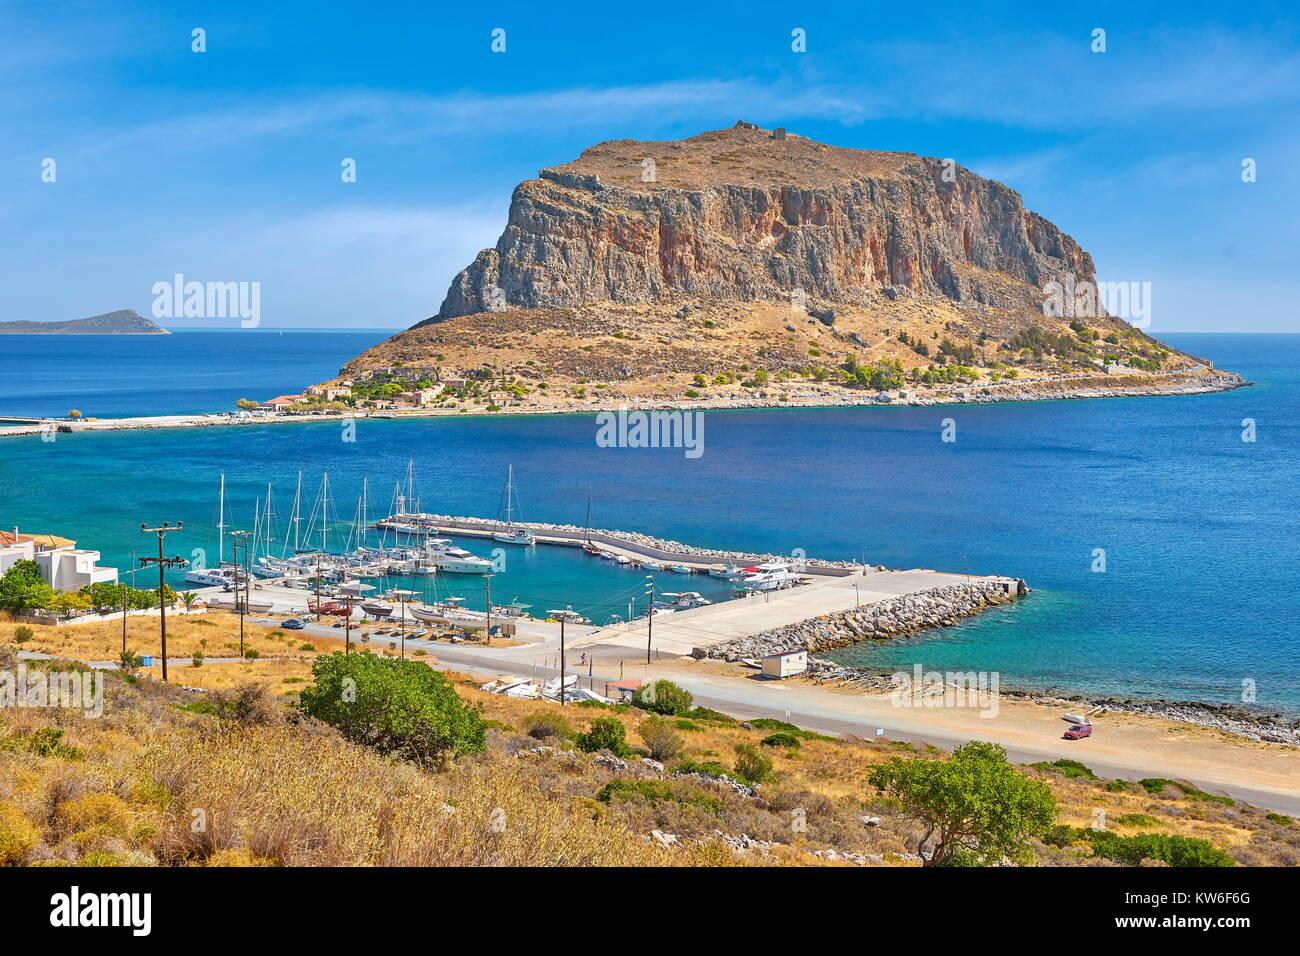 View on Monemvasia, Peloponnese, Greece Stock Photo